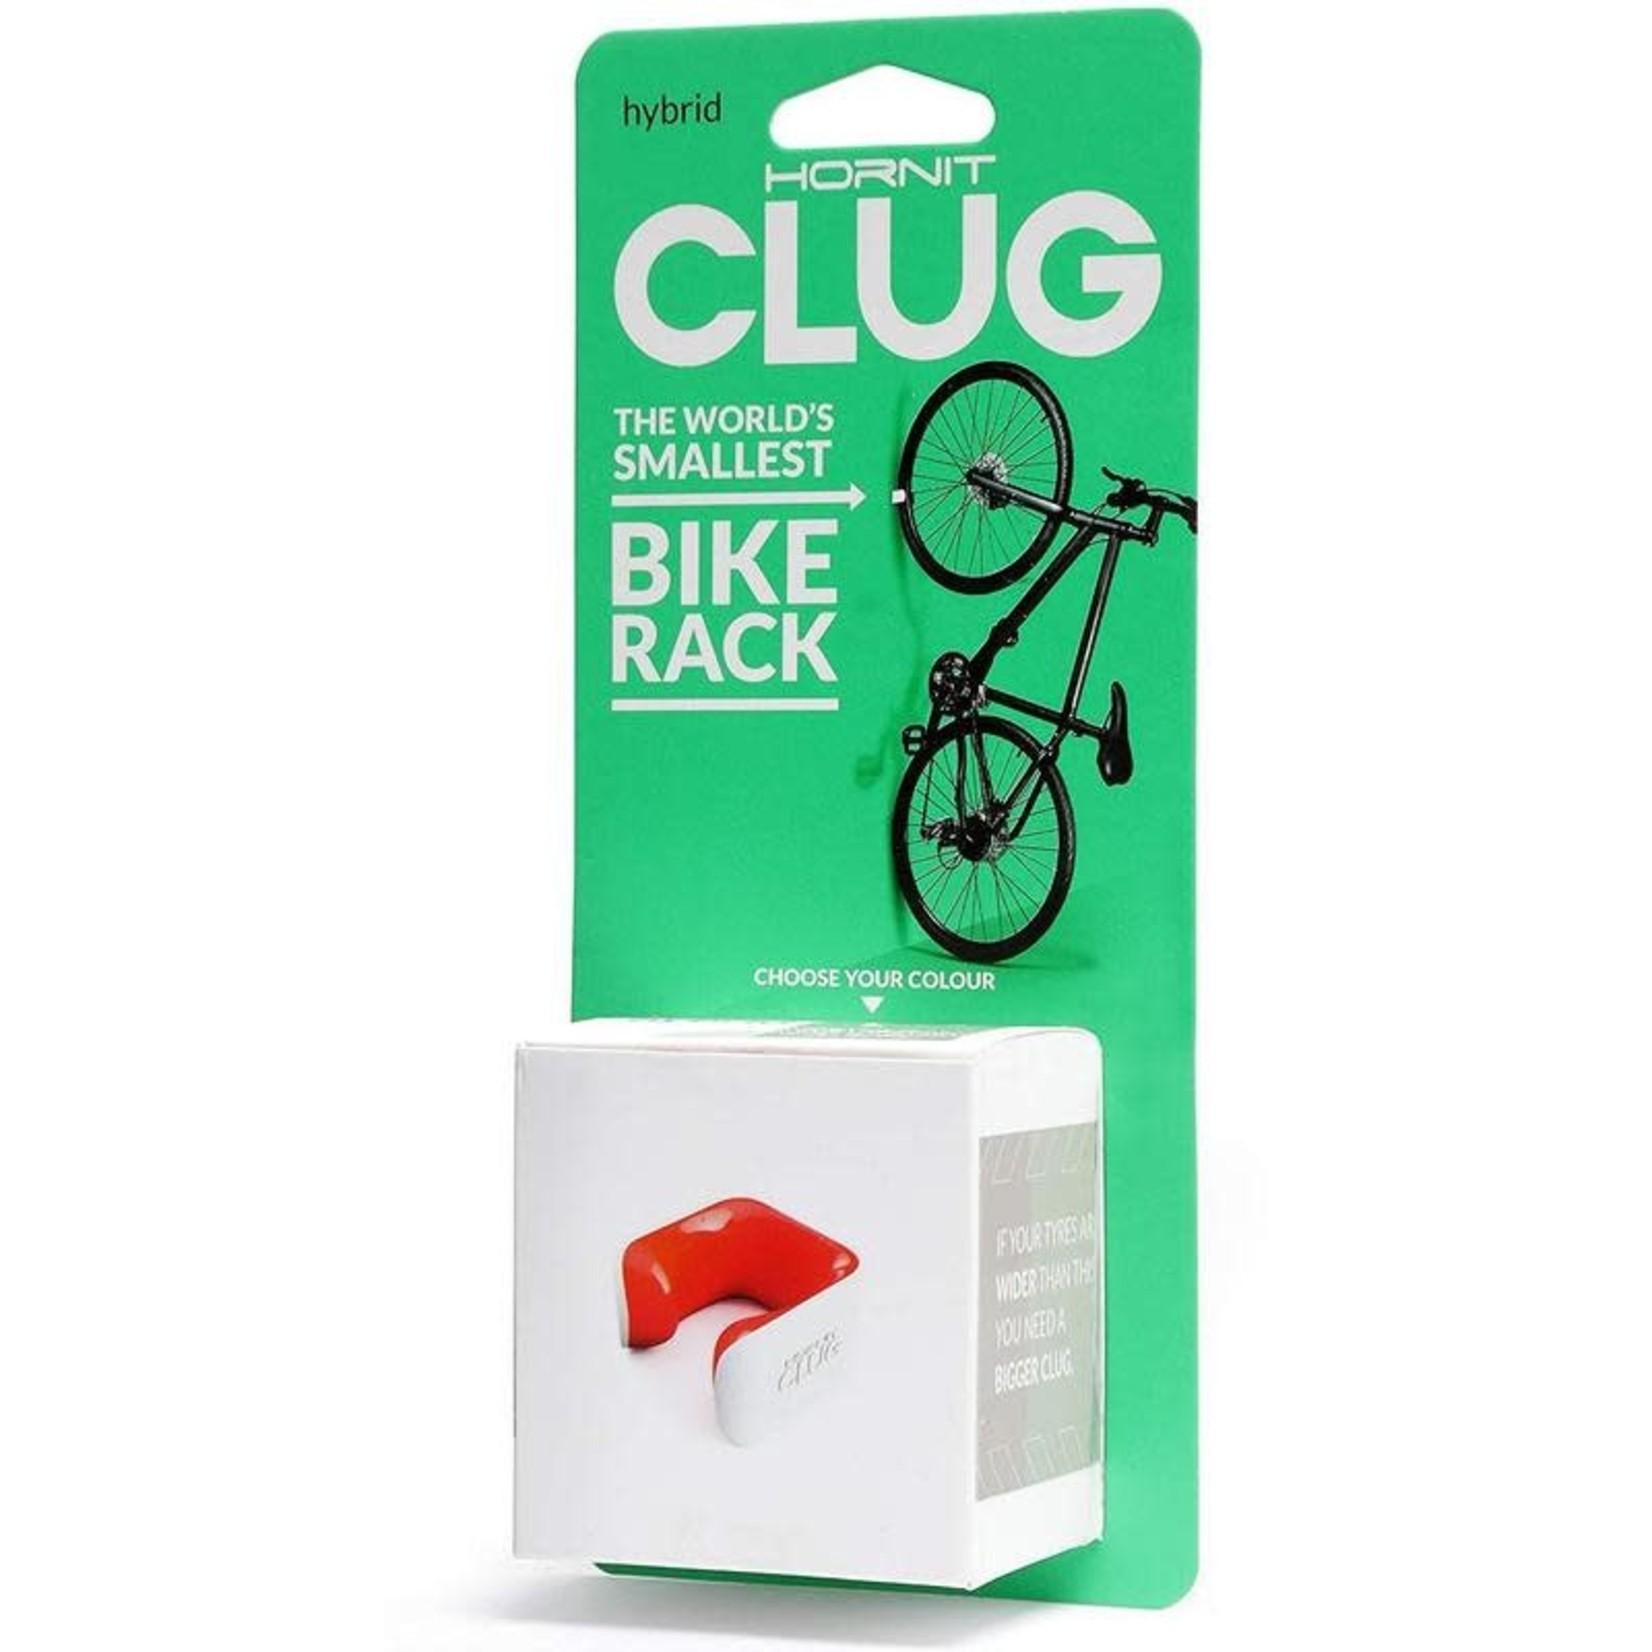 Clug Hybrid Wall Mount Bicycle Storage Rack, White/Orange (fits tires 33mm - 43mm)